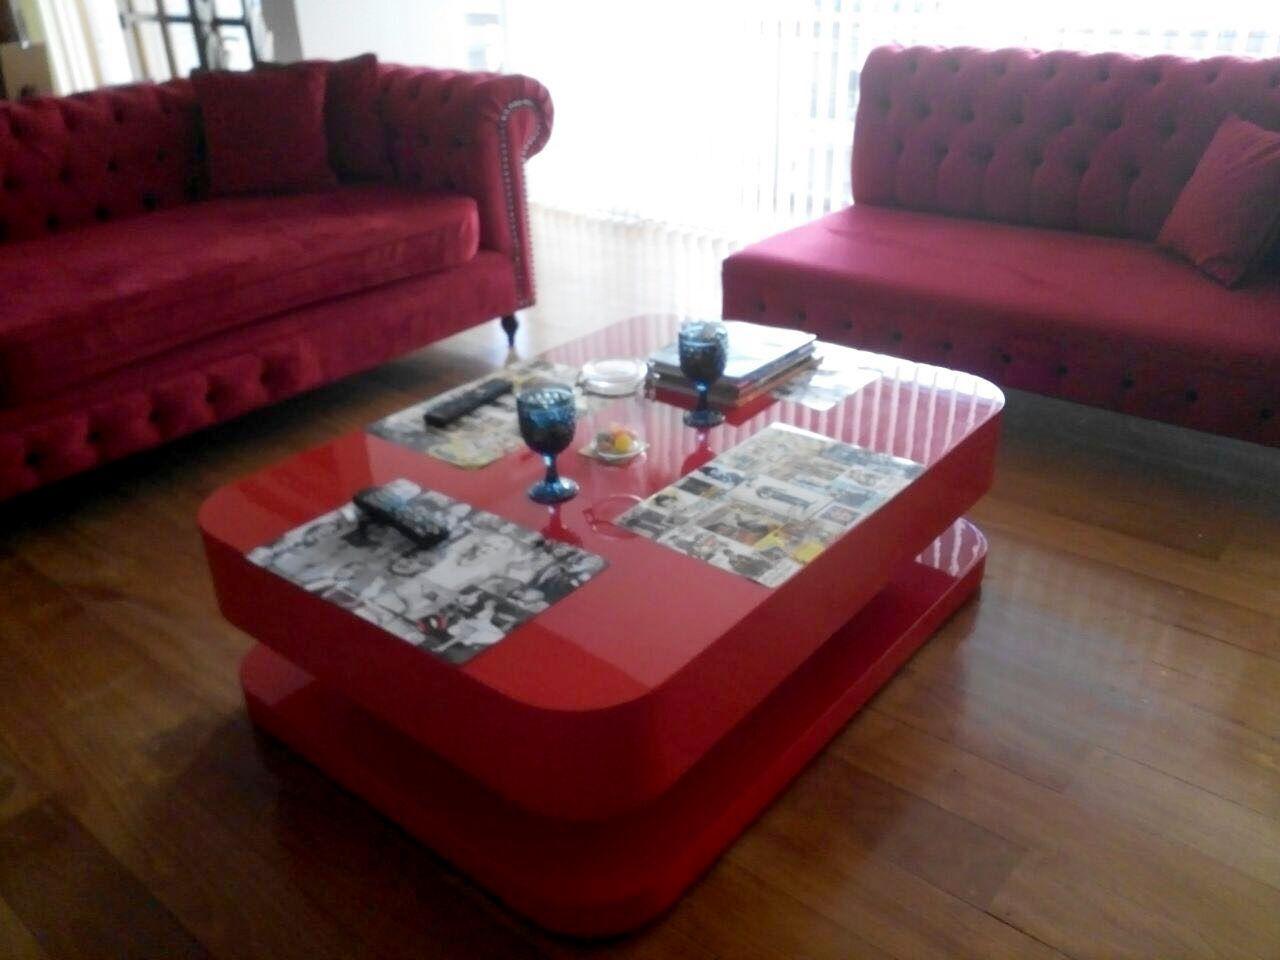 🔥 CURVANS en colores 🔥 🍒 ♥️ mesa baja curvans ♥️ 🍒 ✍ info@curvans.com 👀 www.curvans.com . #diseño #instapic #deco #decoracion #homestyle #urbano #home #hogar #estilo #bairescity #homeinterior #living #design #detalle #interior #style #muebles #furniture #minimal #tv #palermo #decor #design #detalle #interiors #interiordecor #interiorstyling #interiordesign #style